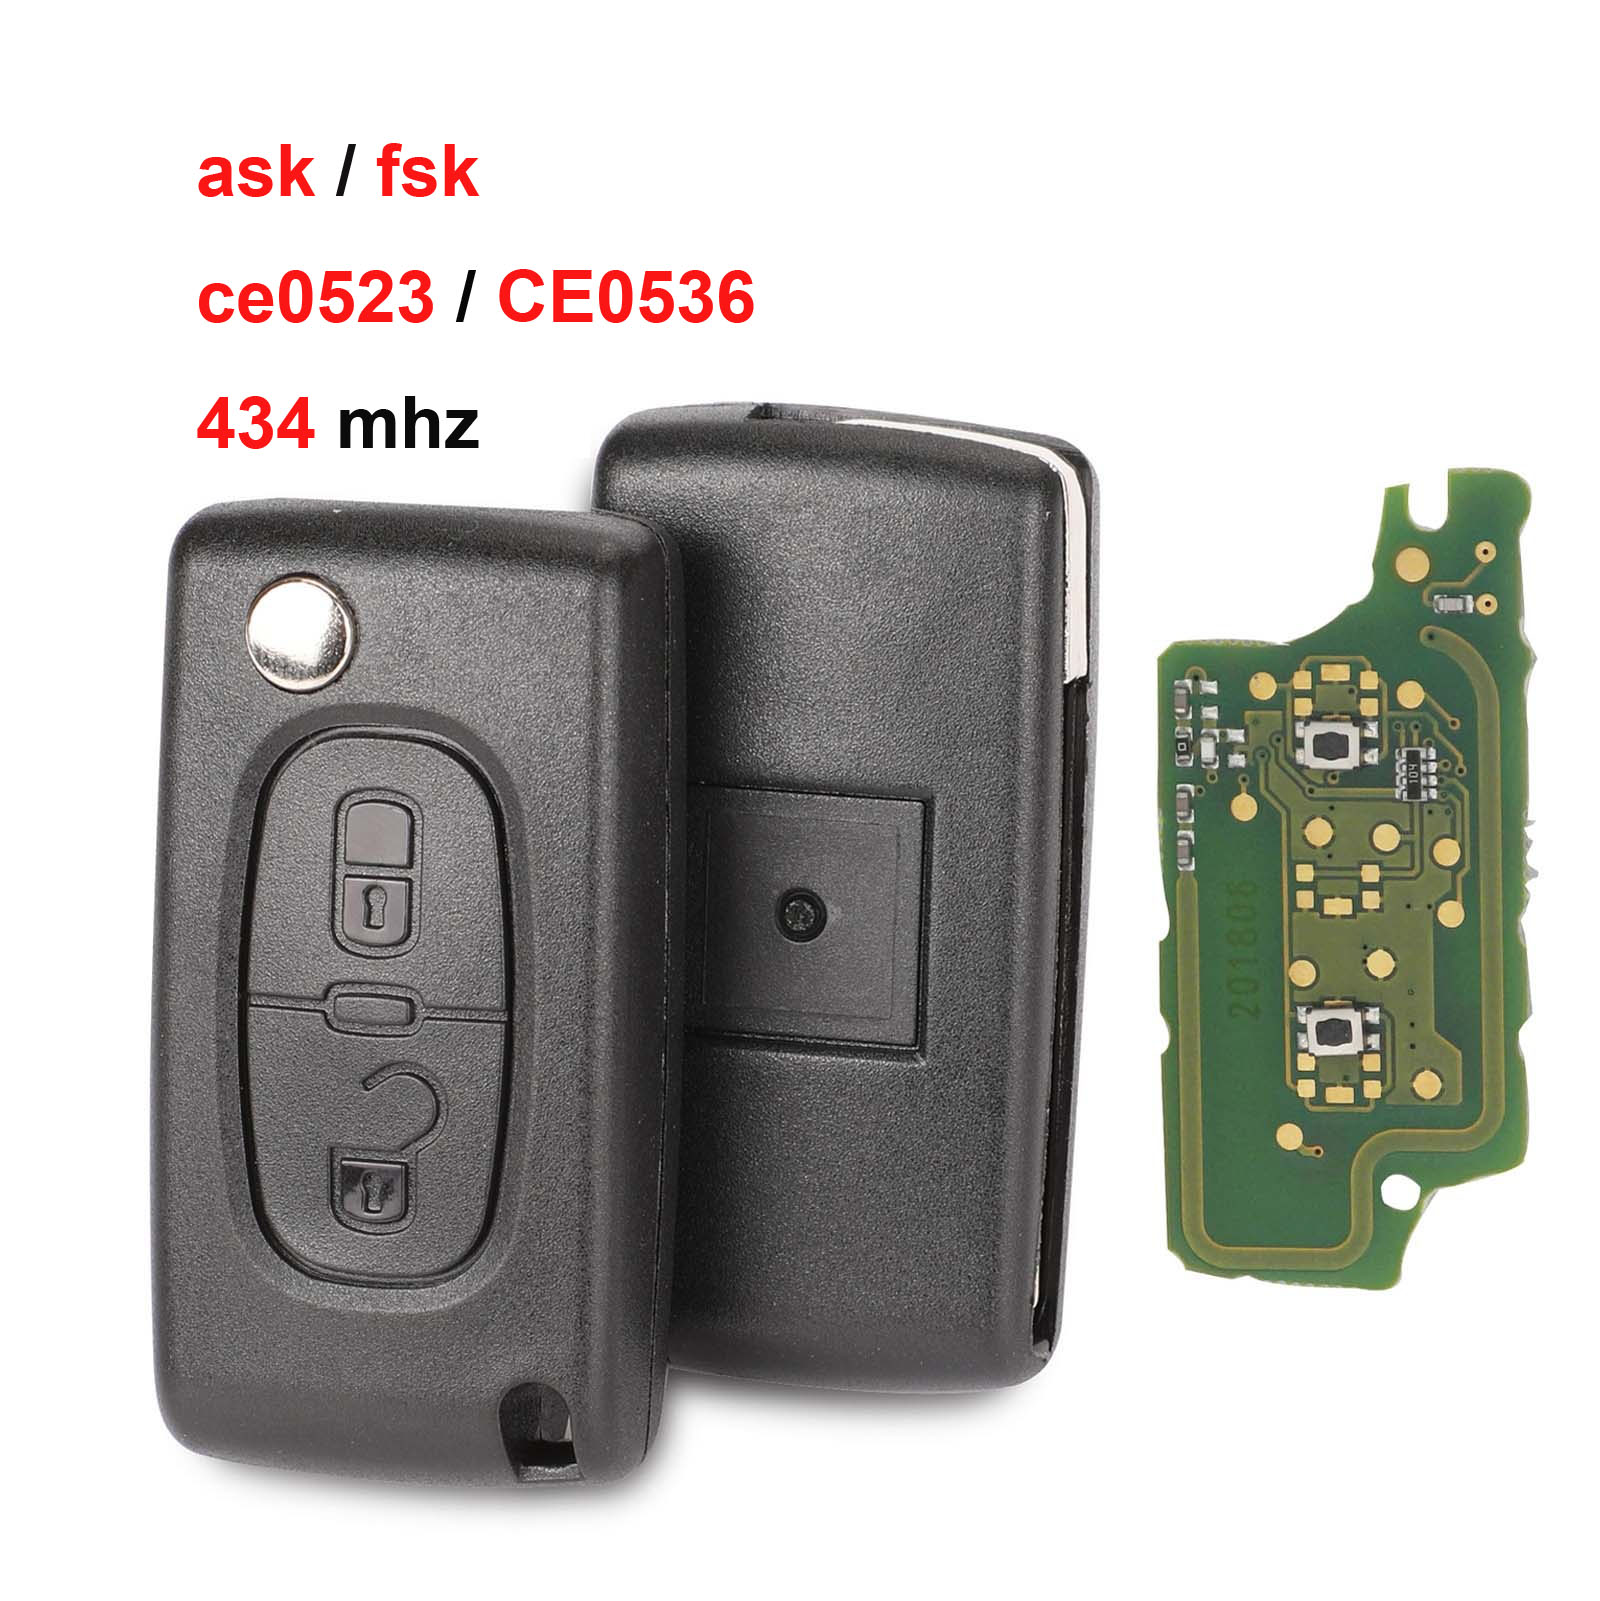 Jingyuqin 434Mhz ASK FSK For Peugeot 107 207 307 308 407 607 For Citroen C2 C3 C4 C5 C6 C8 Xsara Picasso CE0523 Ce0536 VA2/HCA